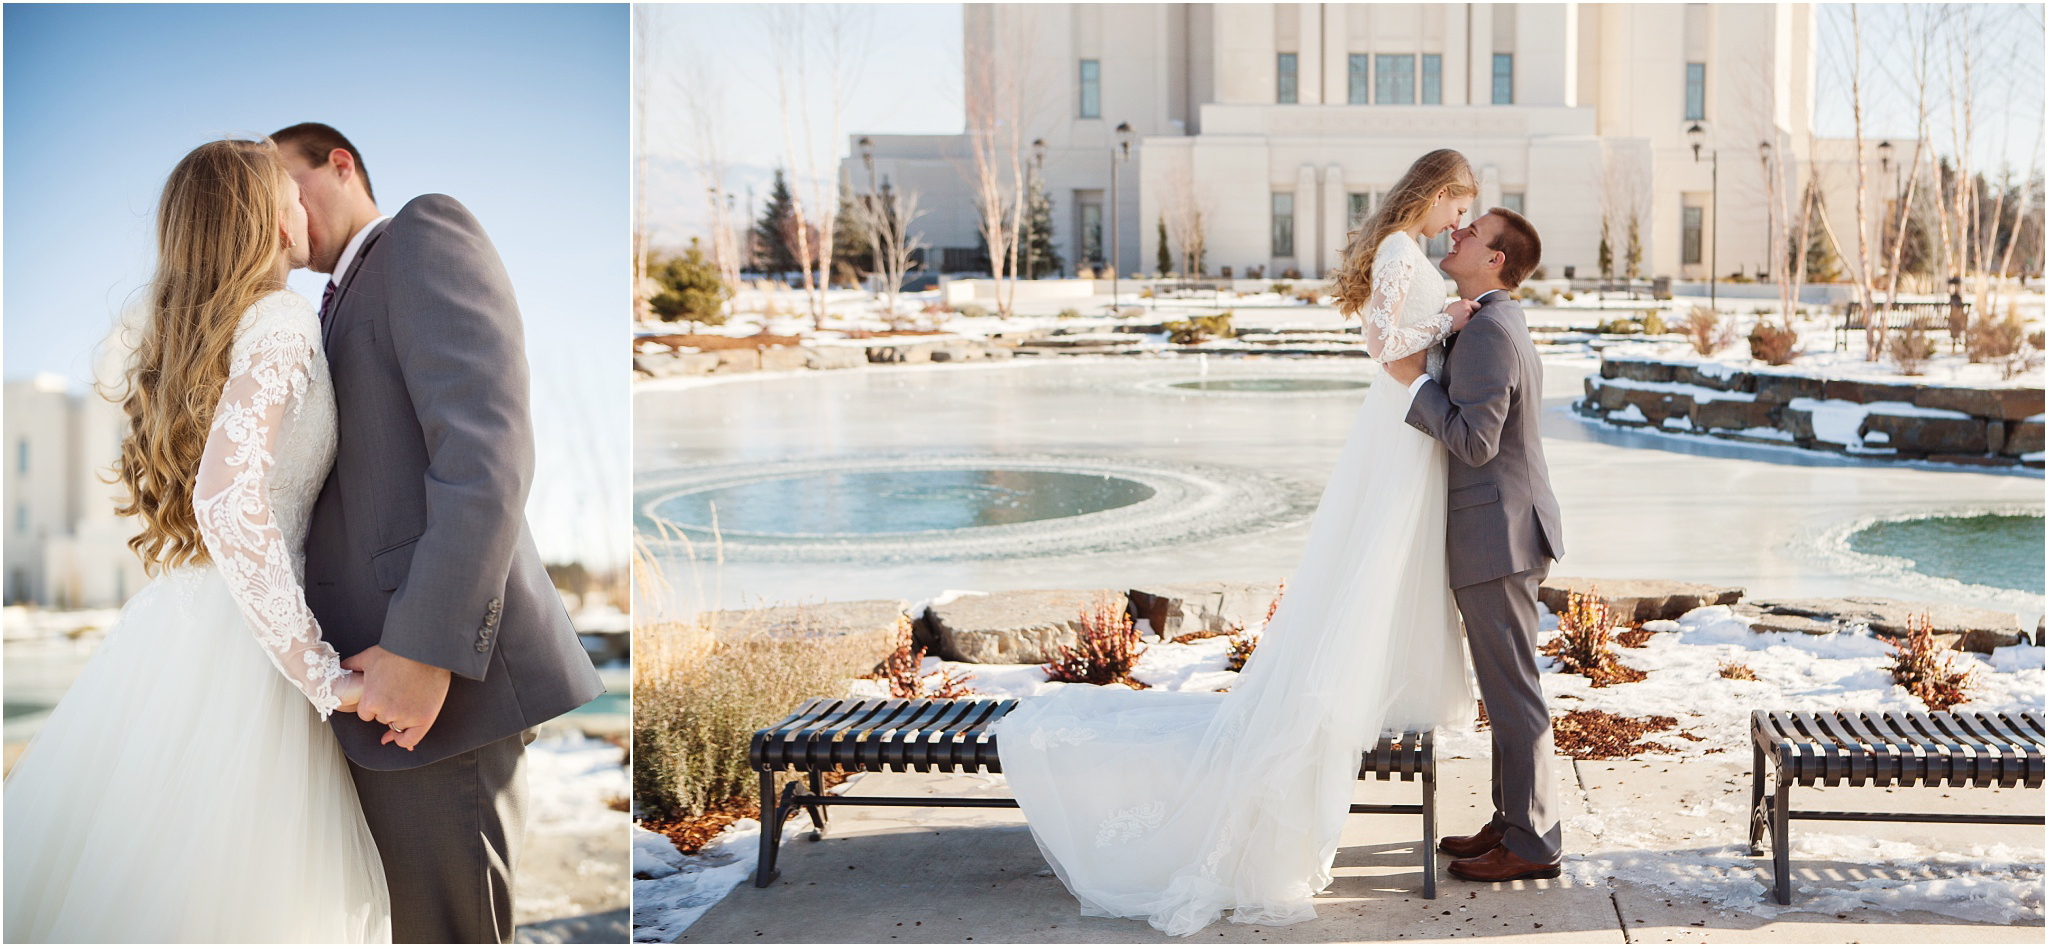 Wedding Photography_Meridian Idaho Temple_Boise Idaho_Leah Southwick Photography_0007.jpg